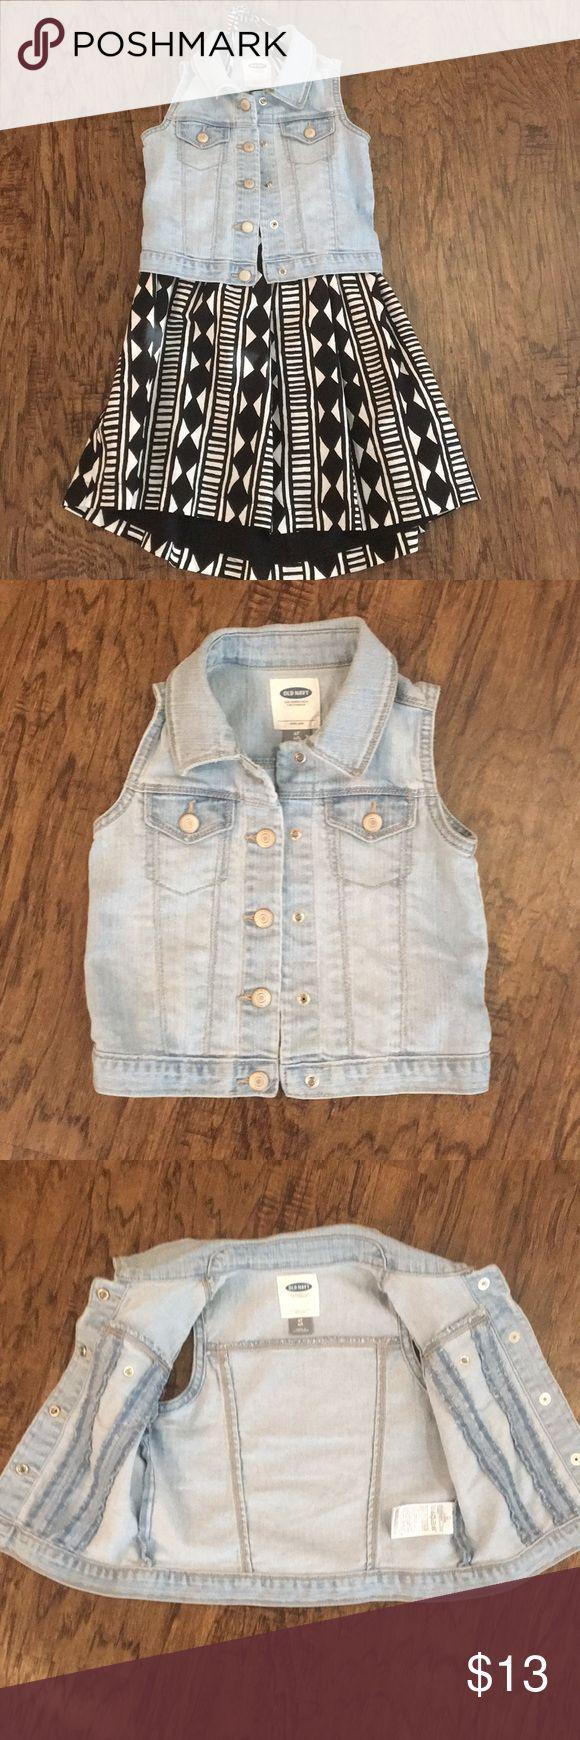 Toddler Blue jean vest Toddler Blue jean button down vest Jackets & Coats Vests